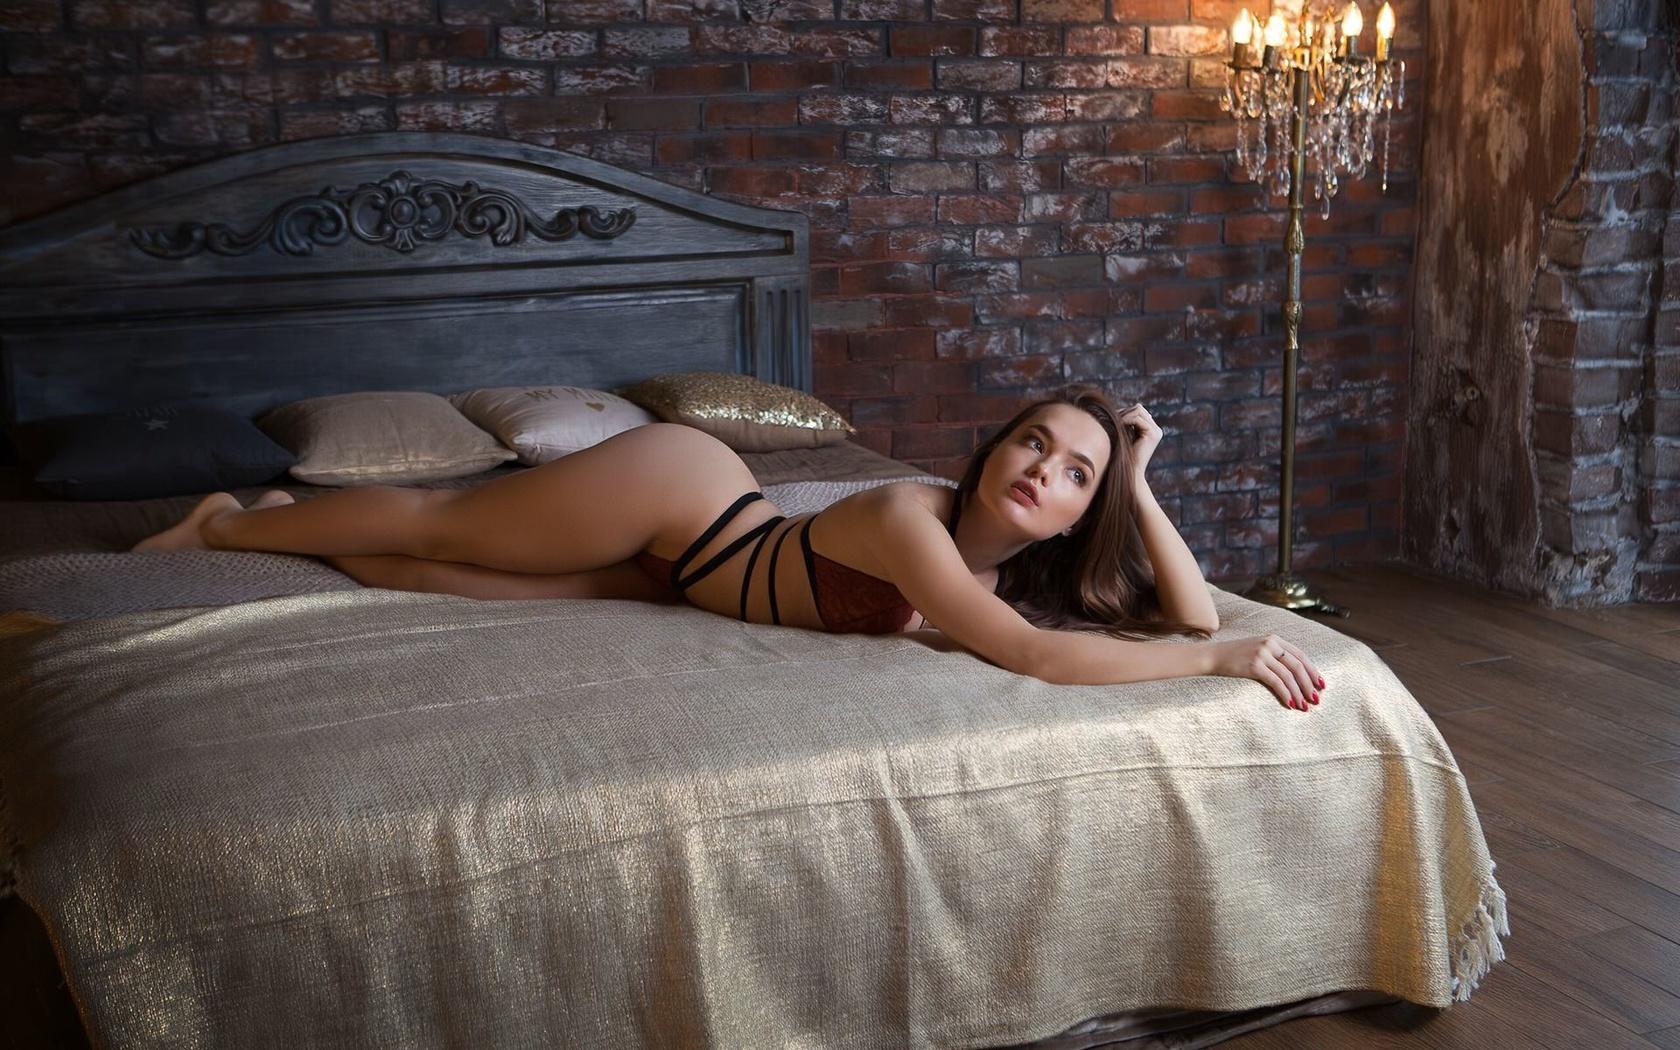 women, in bed, red lingerie, wall, bricks, red nails, looking away, lamp, комната,стена,кирпич,канделябр,кровать,покрывало,подушки,девушка,модель,позирует,волосы,шатенка,брови,глаза,взгляд,в сторону,губы,помада,, кольцо,стройная,фигурка,талия,бедра,лифчик